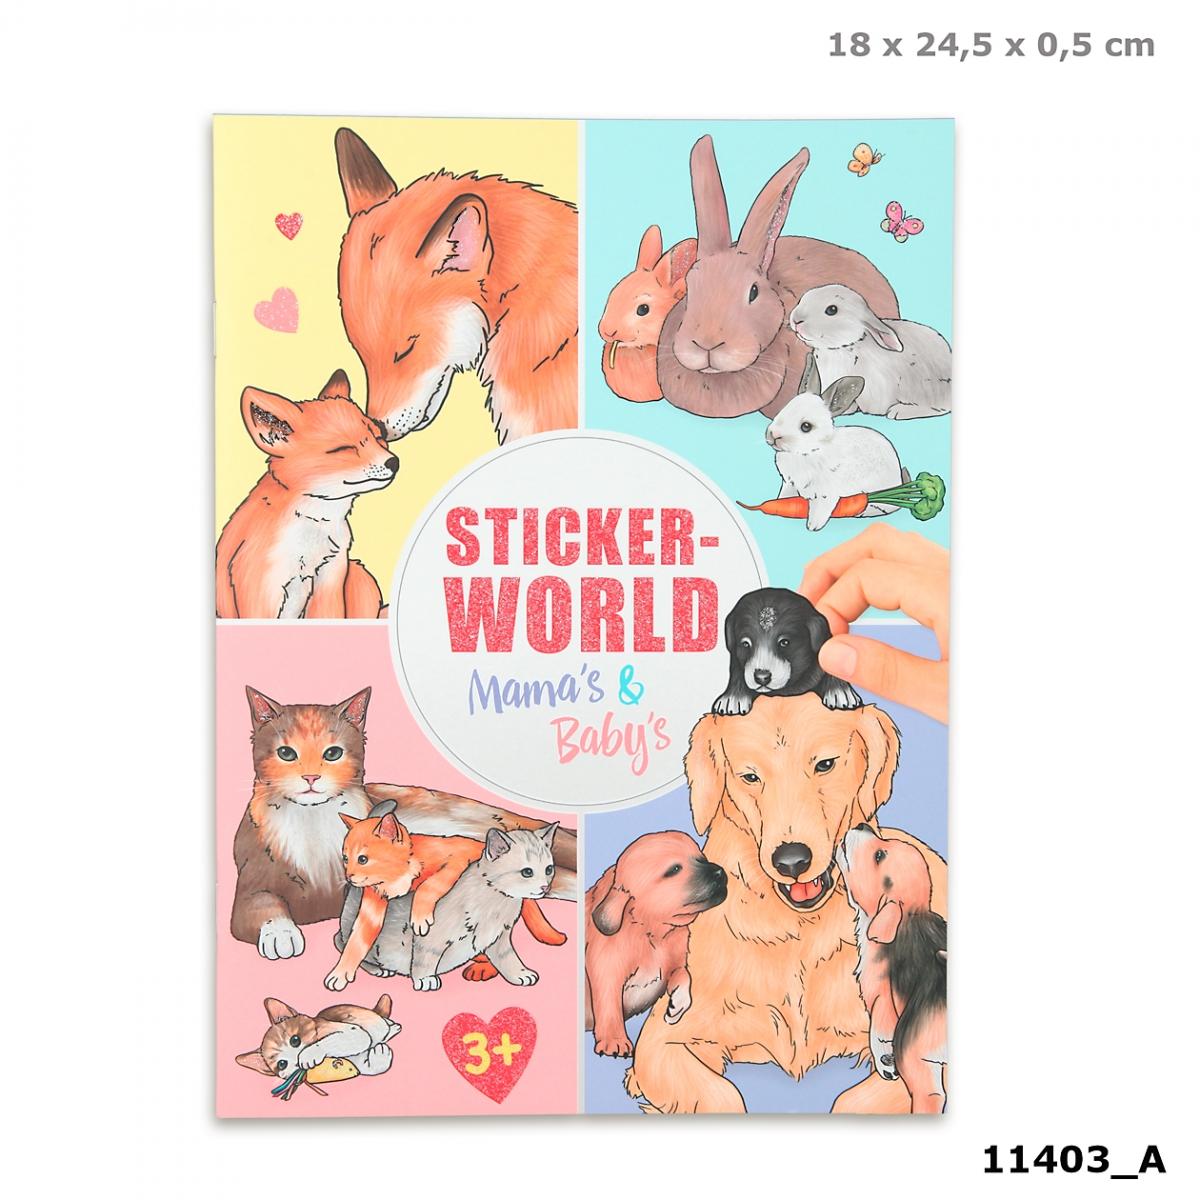 Mama's & Baby's Stickerworld